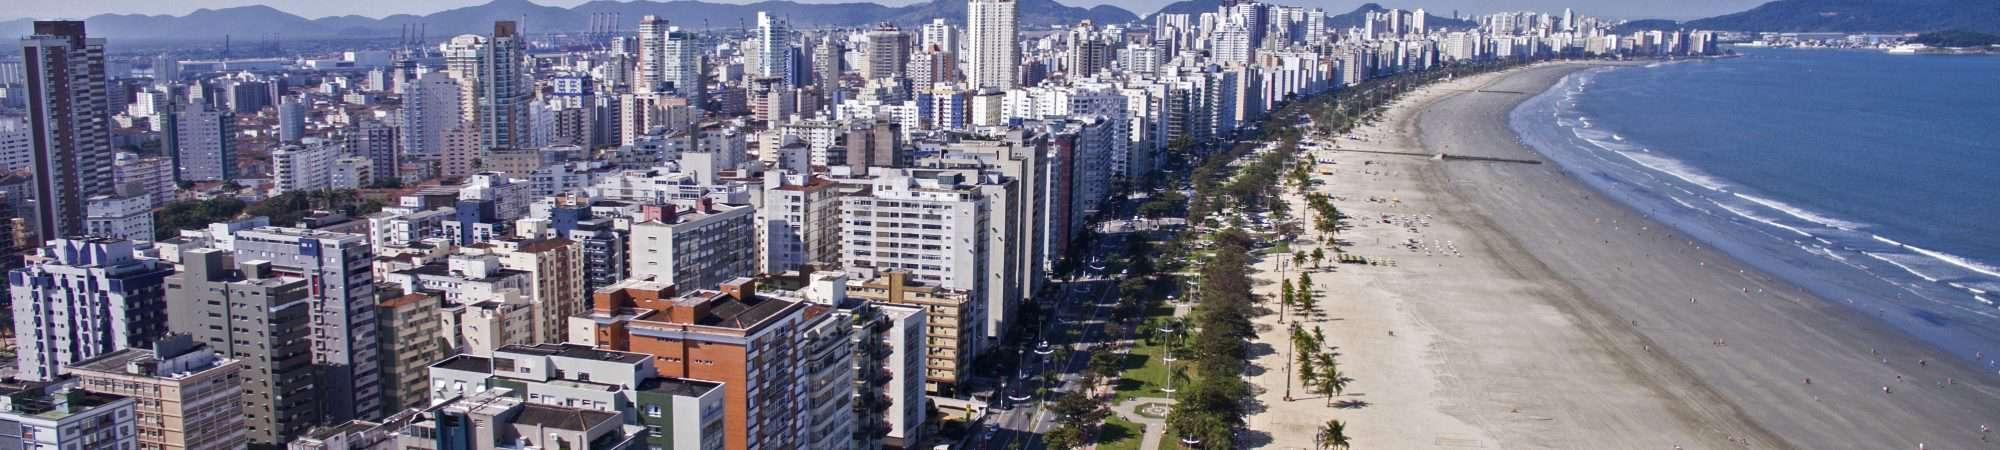 Santos-SP-shutterstock_465603152-2000x450